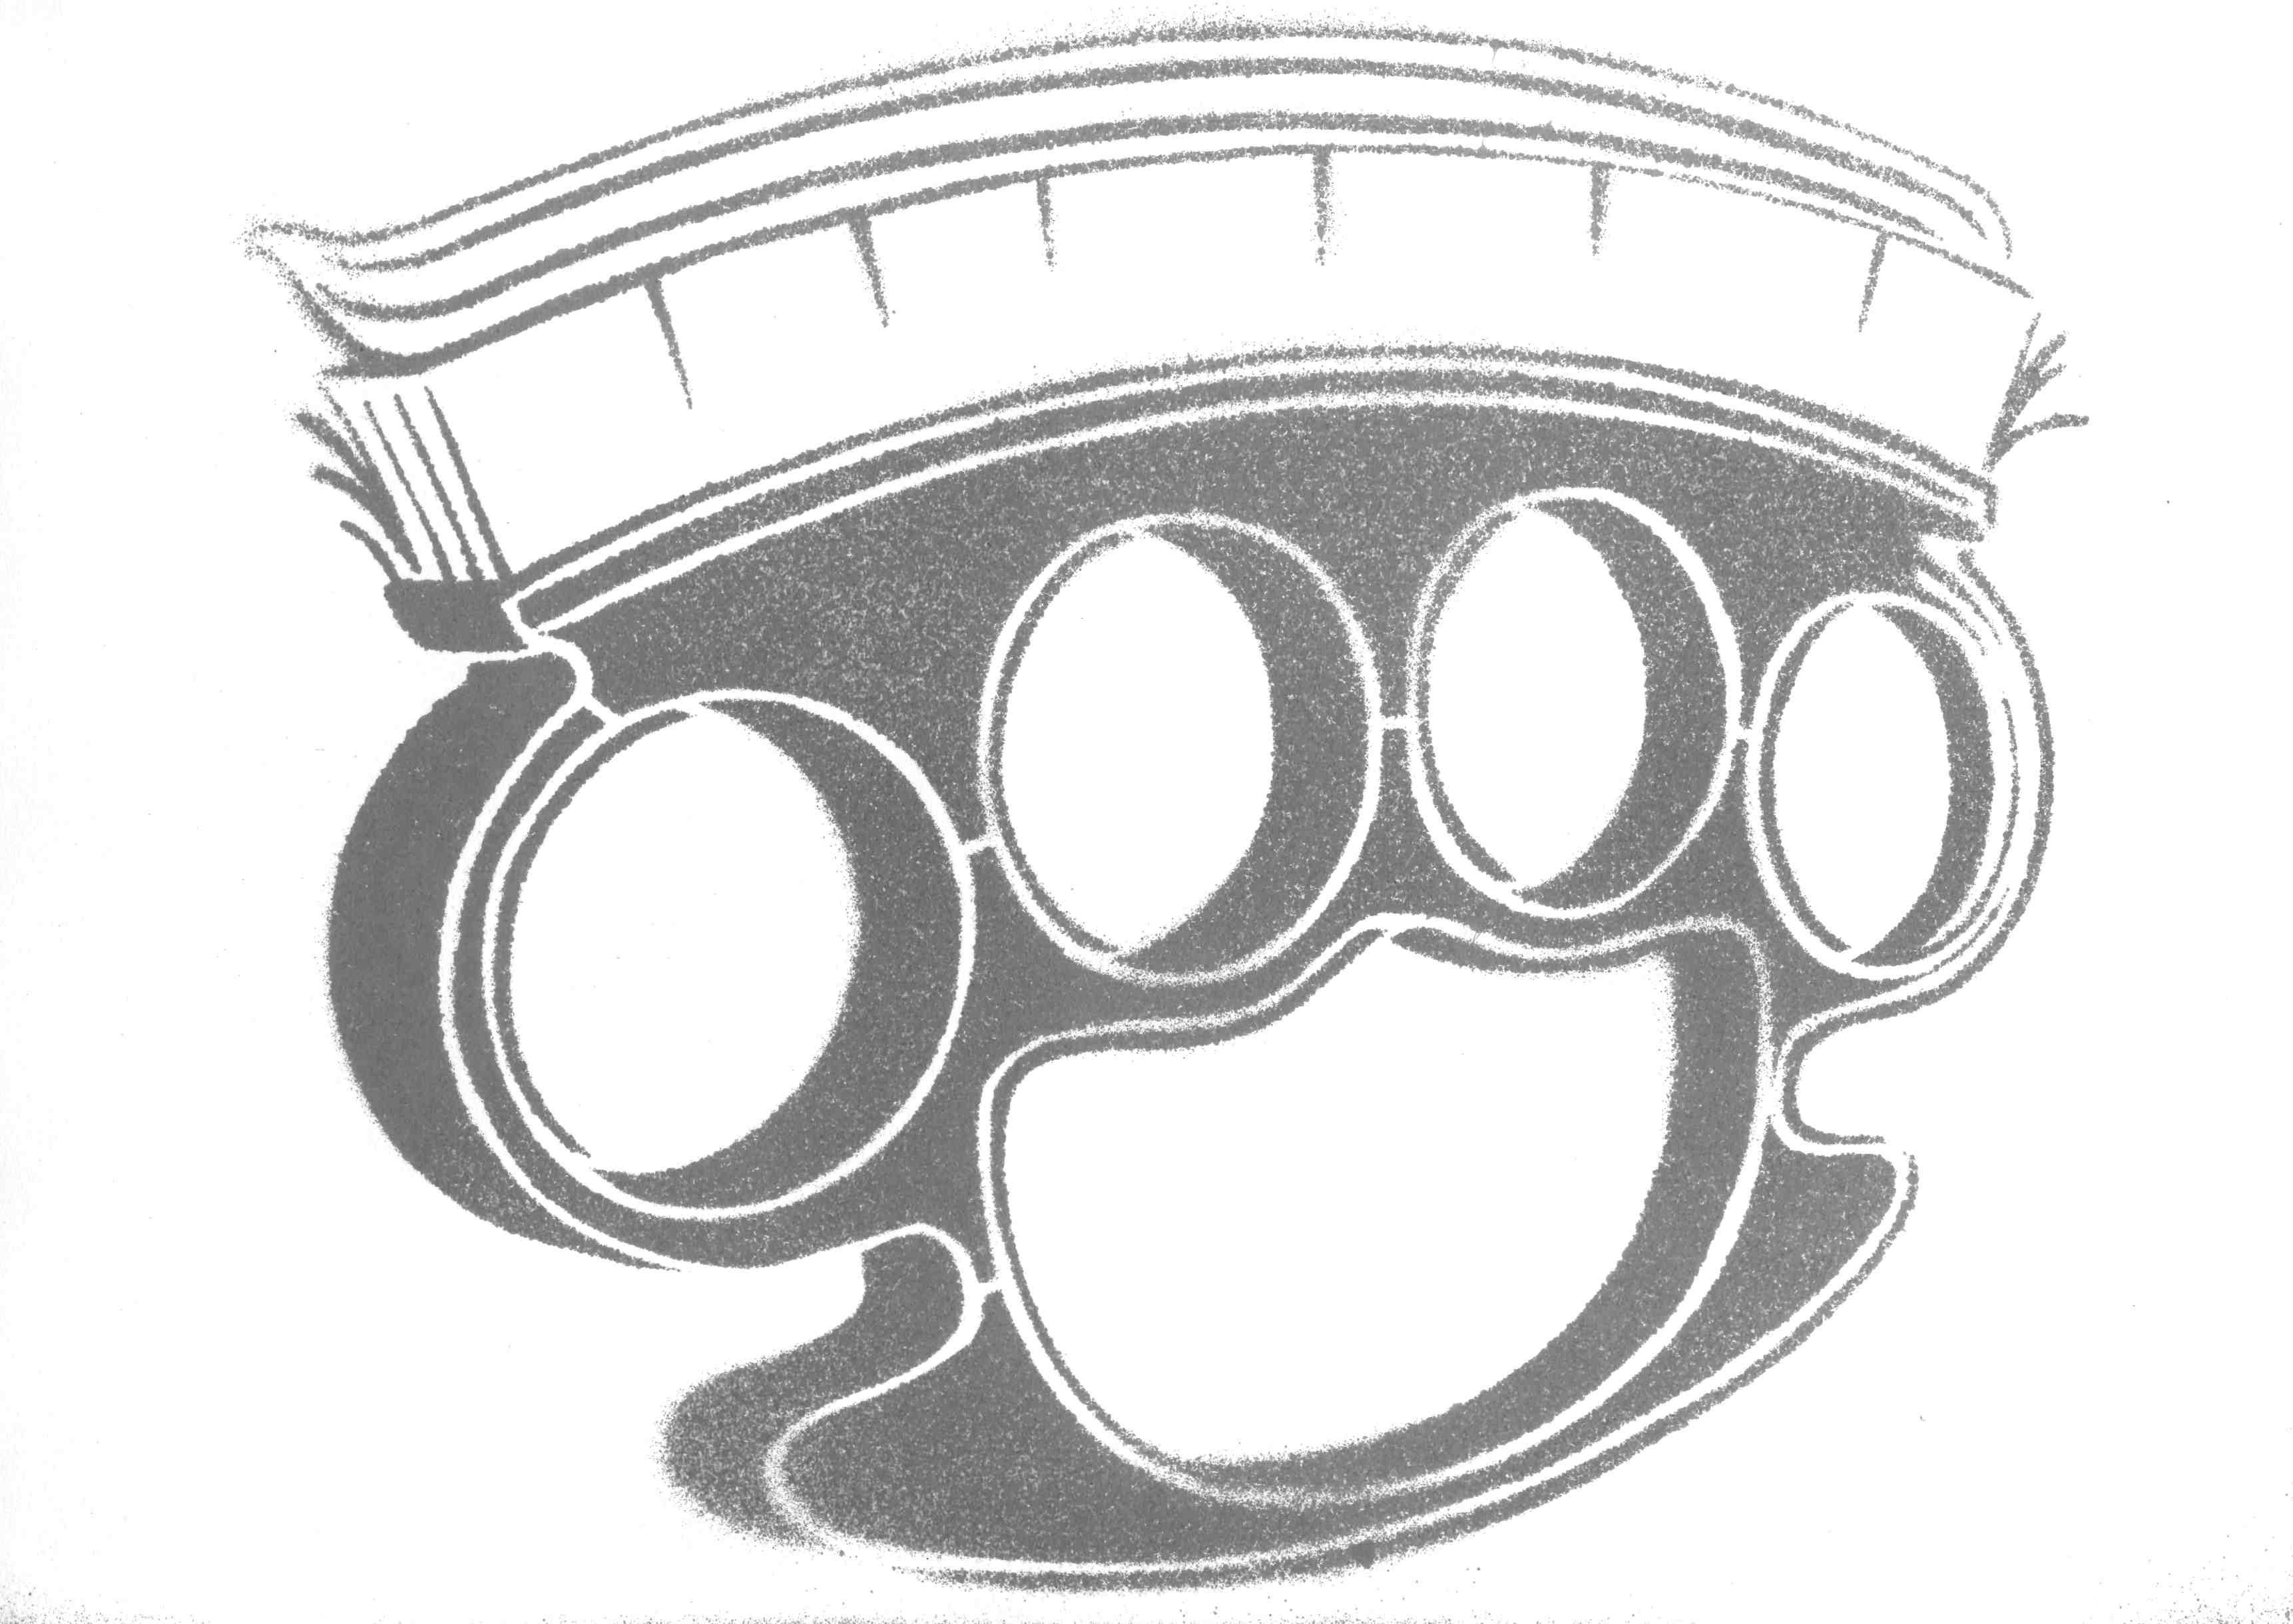 brass knuckles template - fresh brass knuckles by shvepseg on deviantart